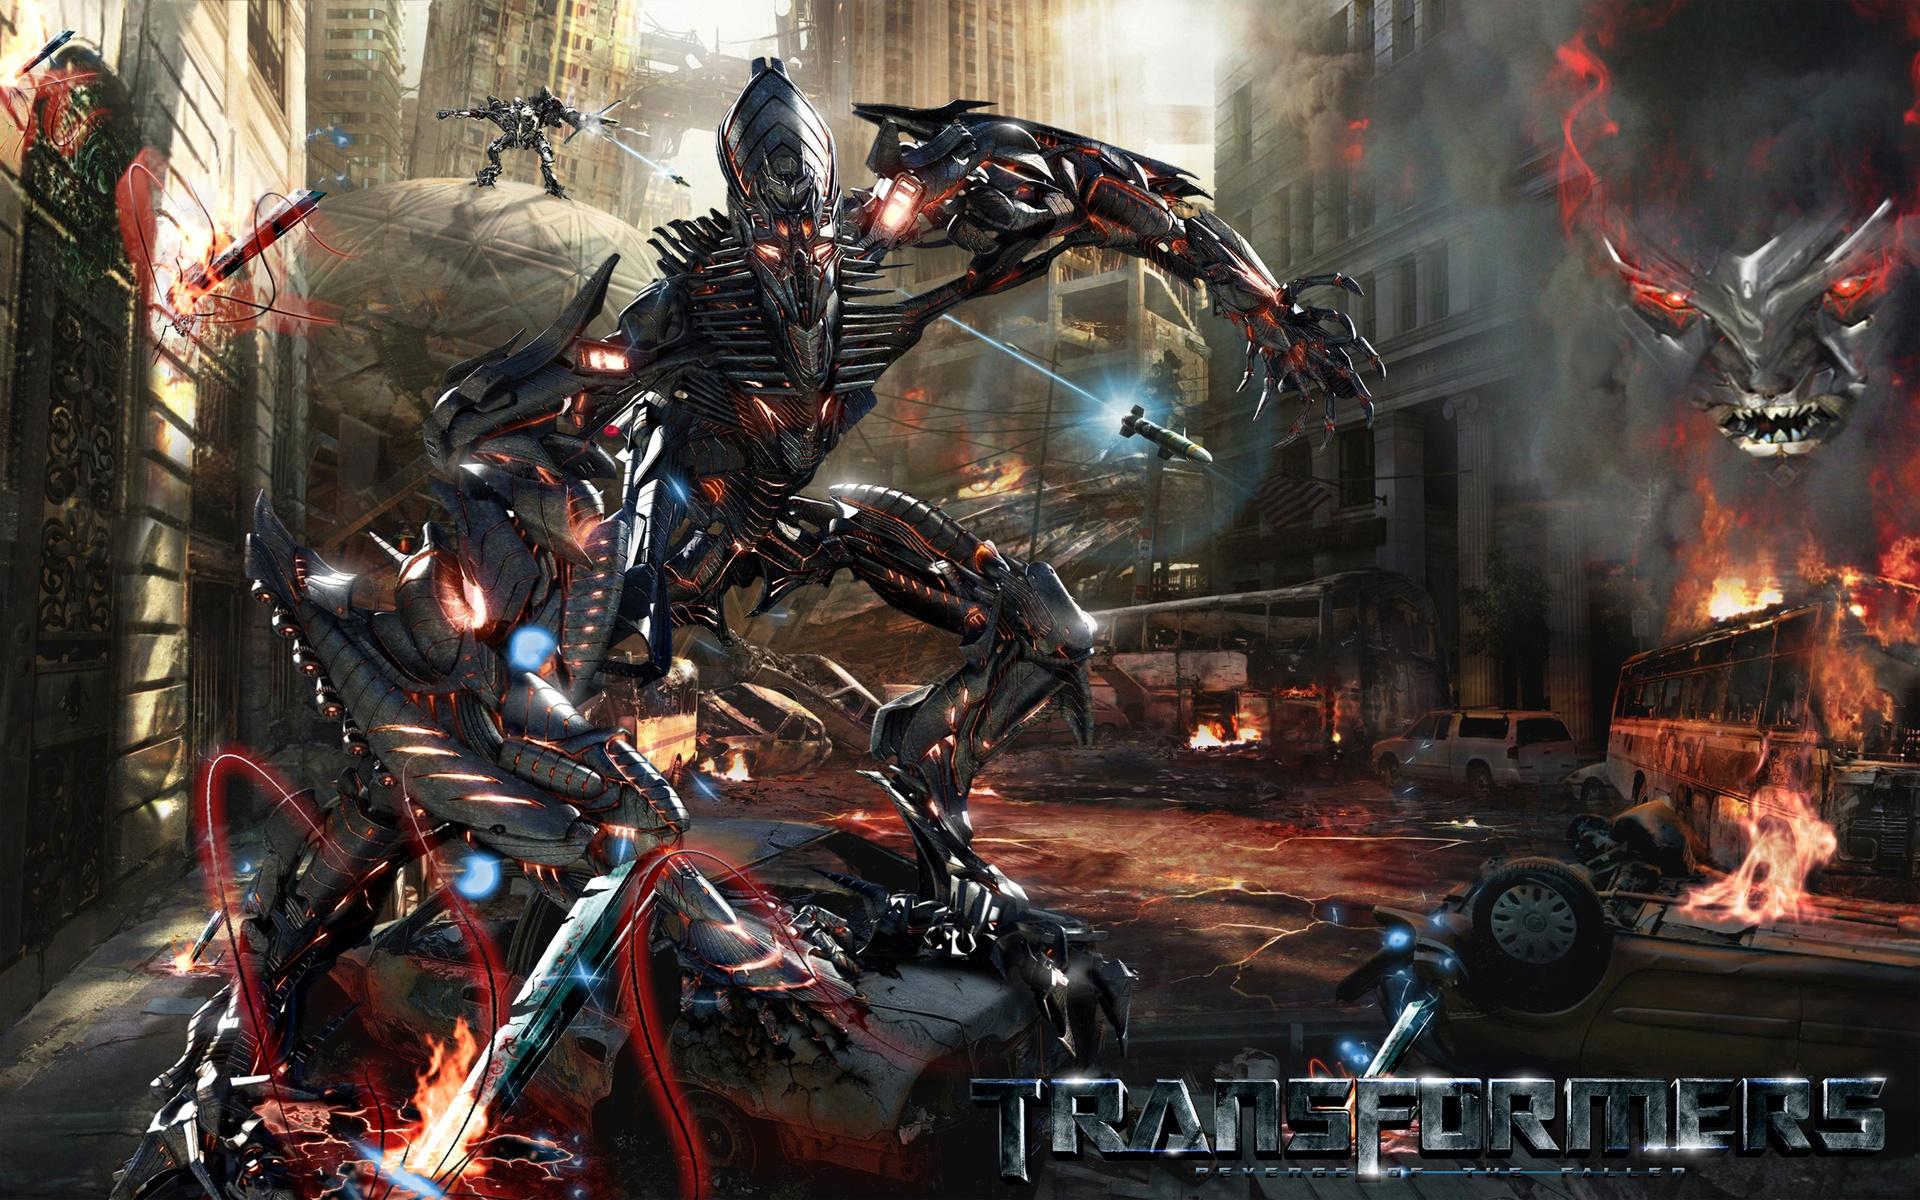 Wallpaper Transformers Revenge Of The Fallen 1920x1200 Hd Picture